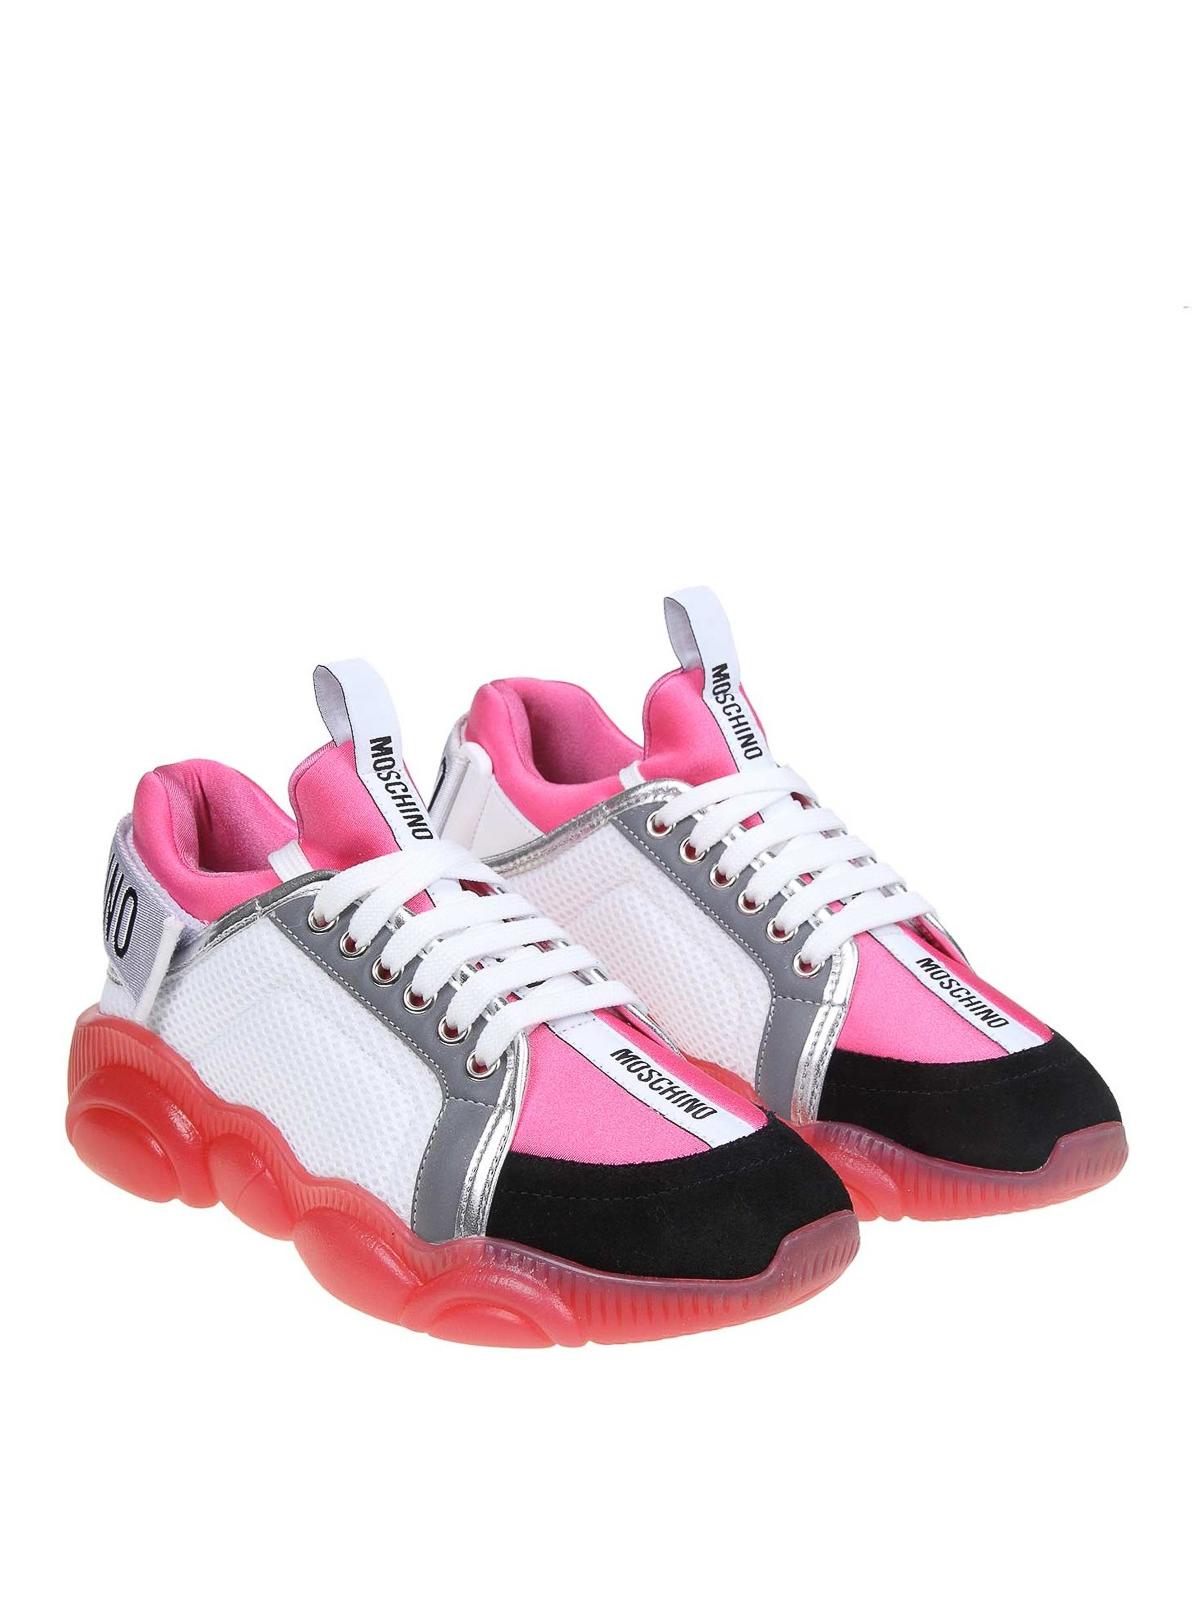 Moschino - Teddy Run pink sneakers